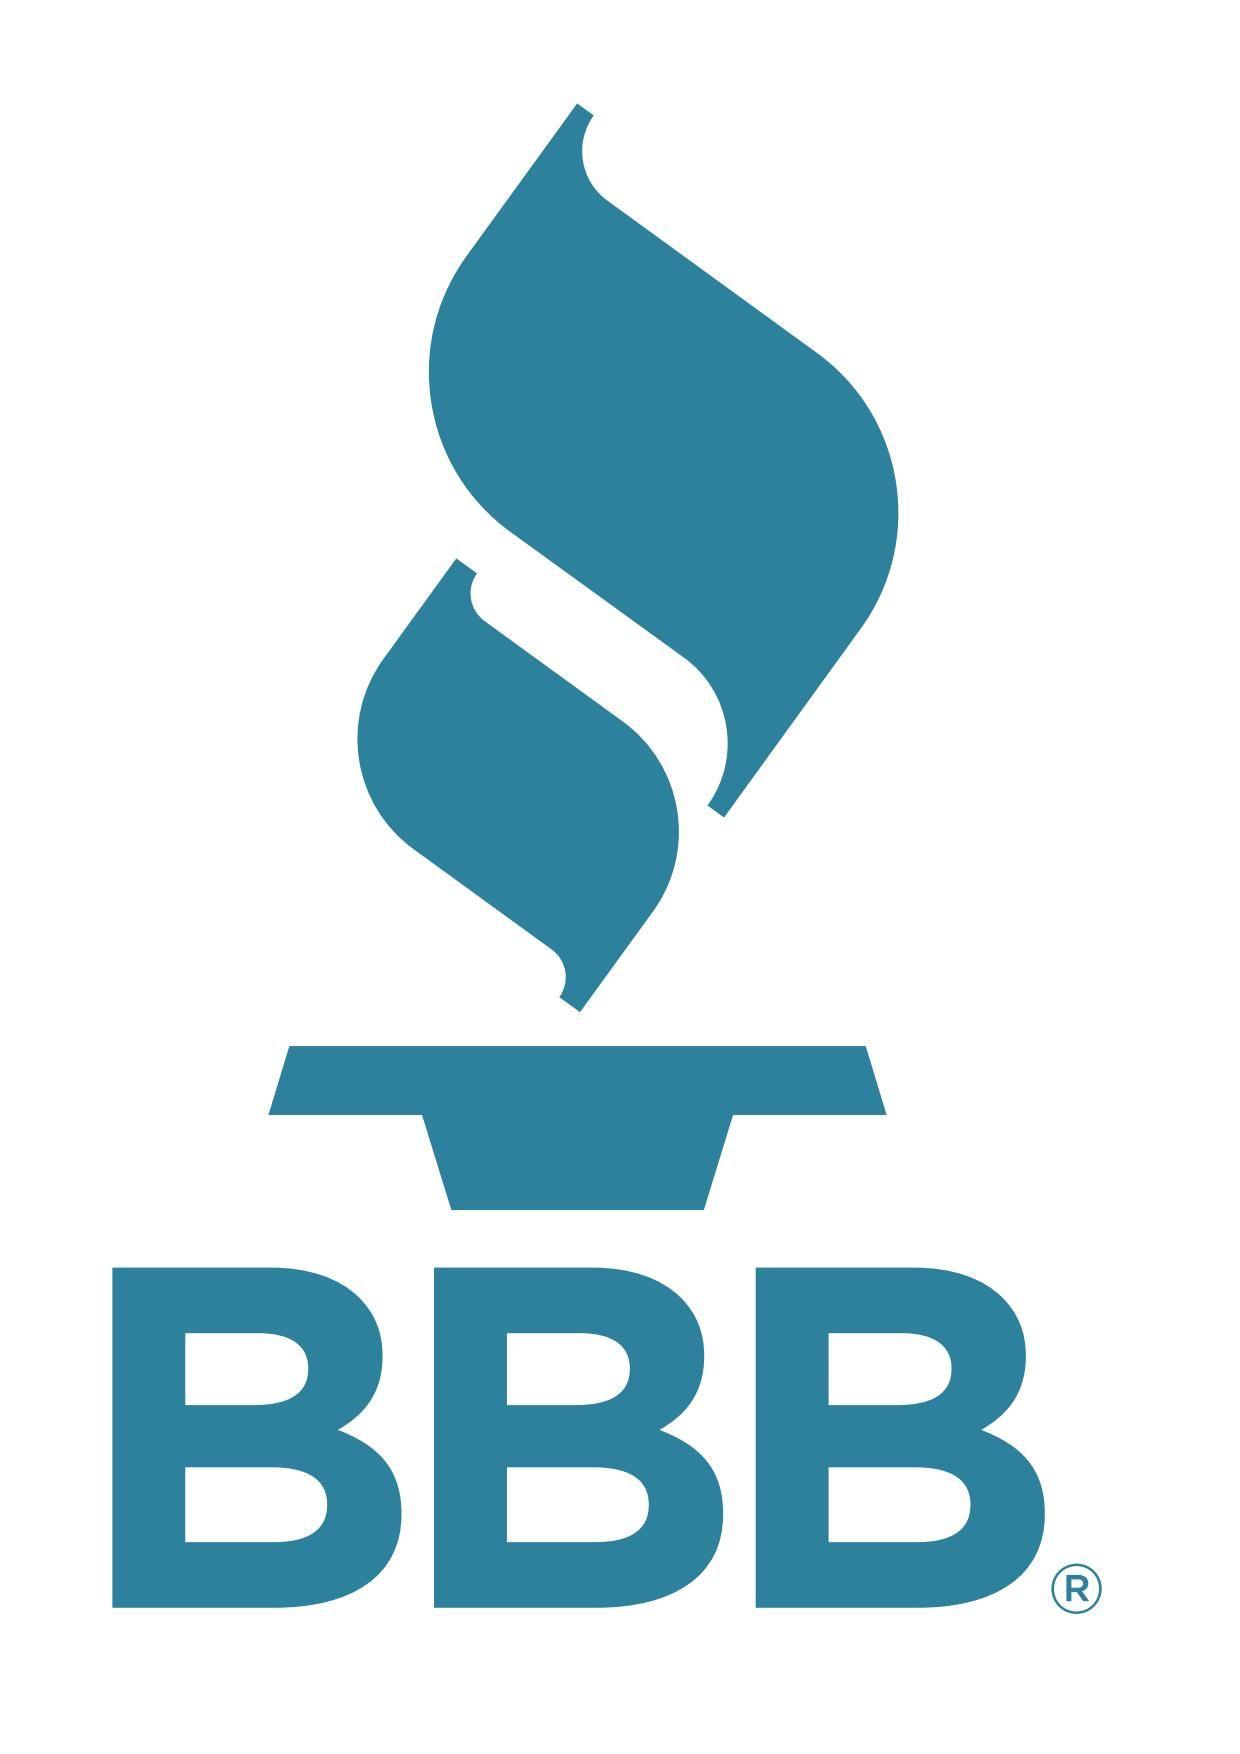 Better Business Bureau (BBB) Logo [EPS File] Vector EPS Free Download, Logo, Icons, Brand Emblems